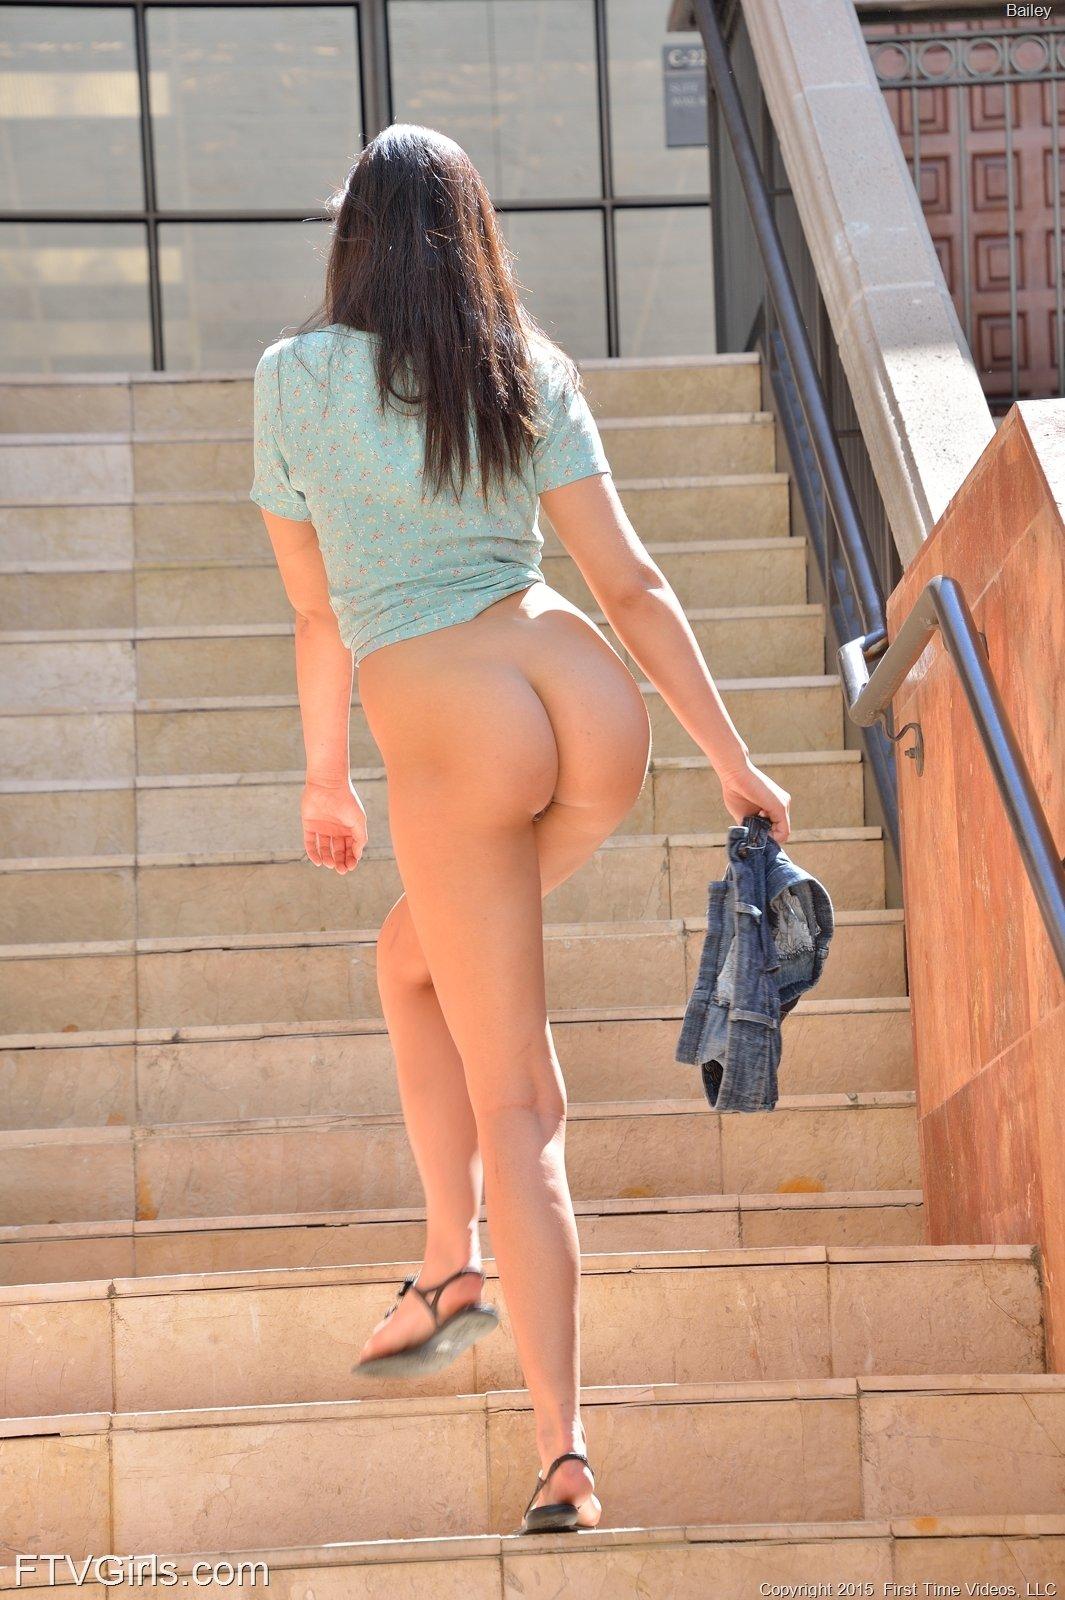 Ftv Girl Bailey In Under Her Shorts 16 Photos  Video -5293